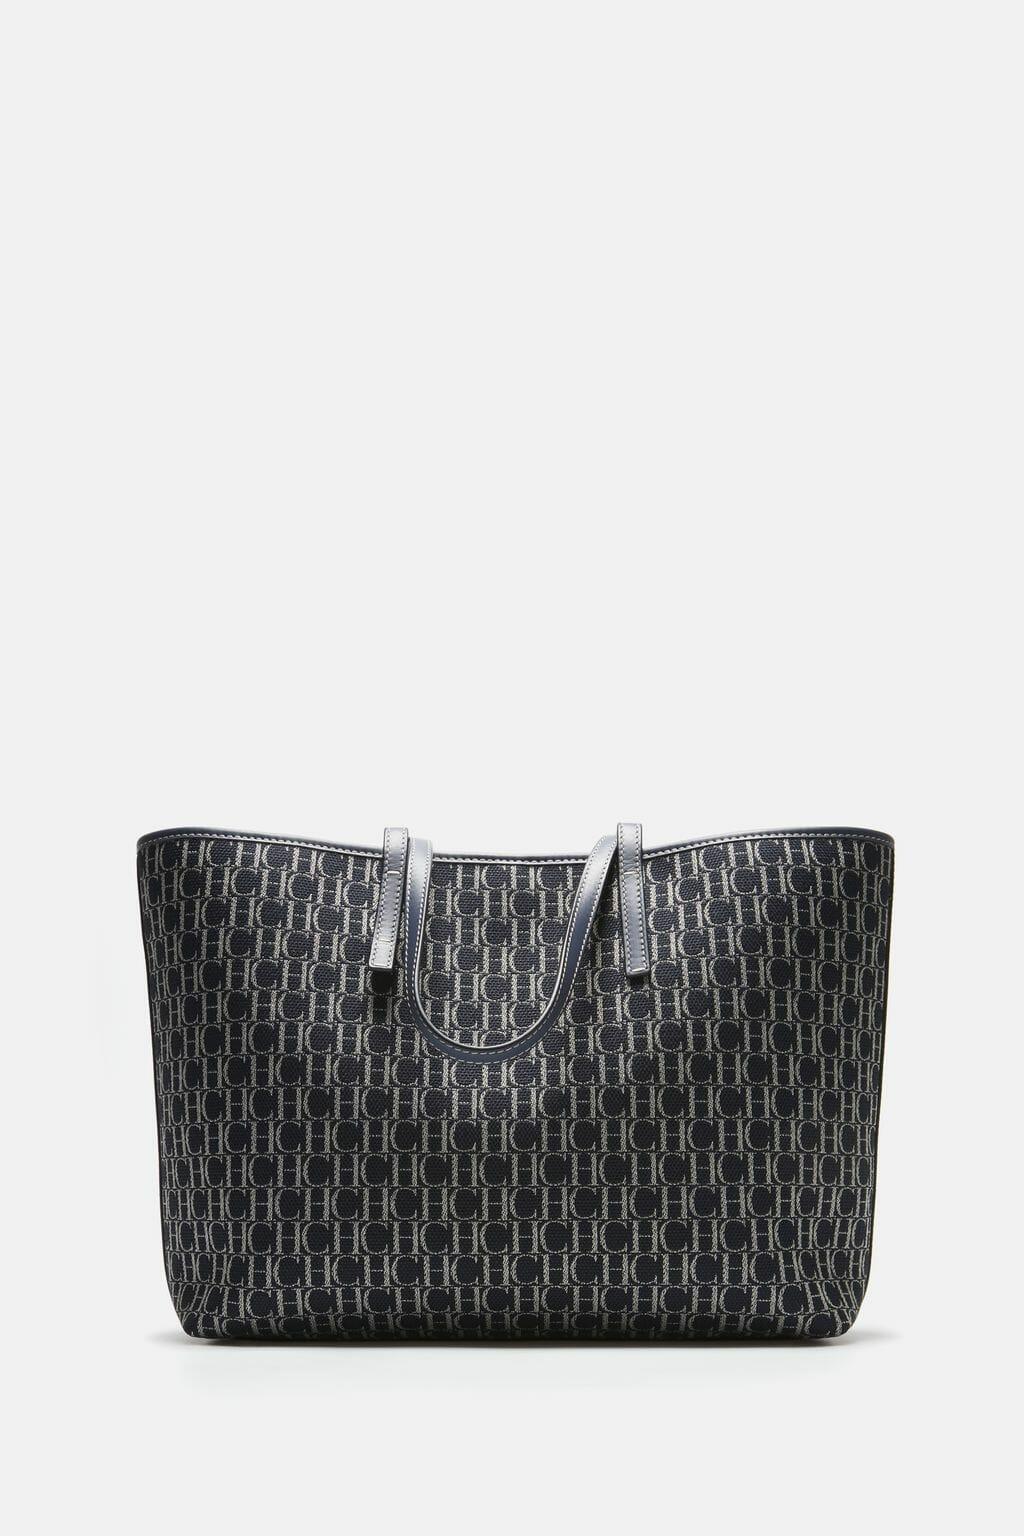 a400df0c7b6 Ch carolina herrera bags collection must have look jpg 1024x1536 Carolina  herrera bags online